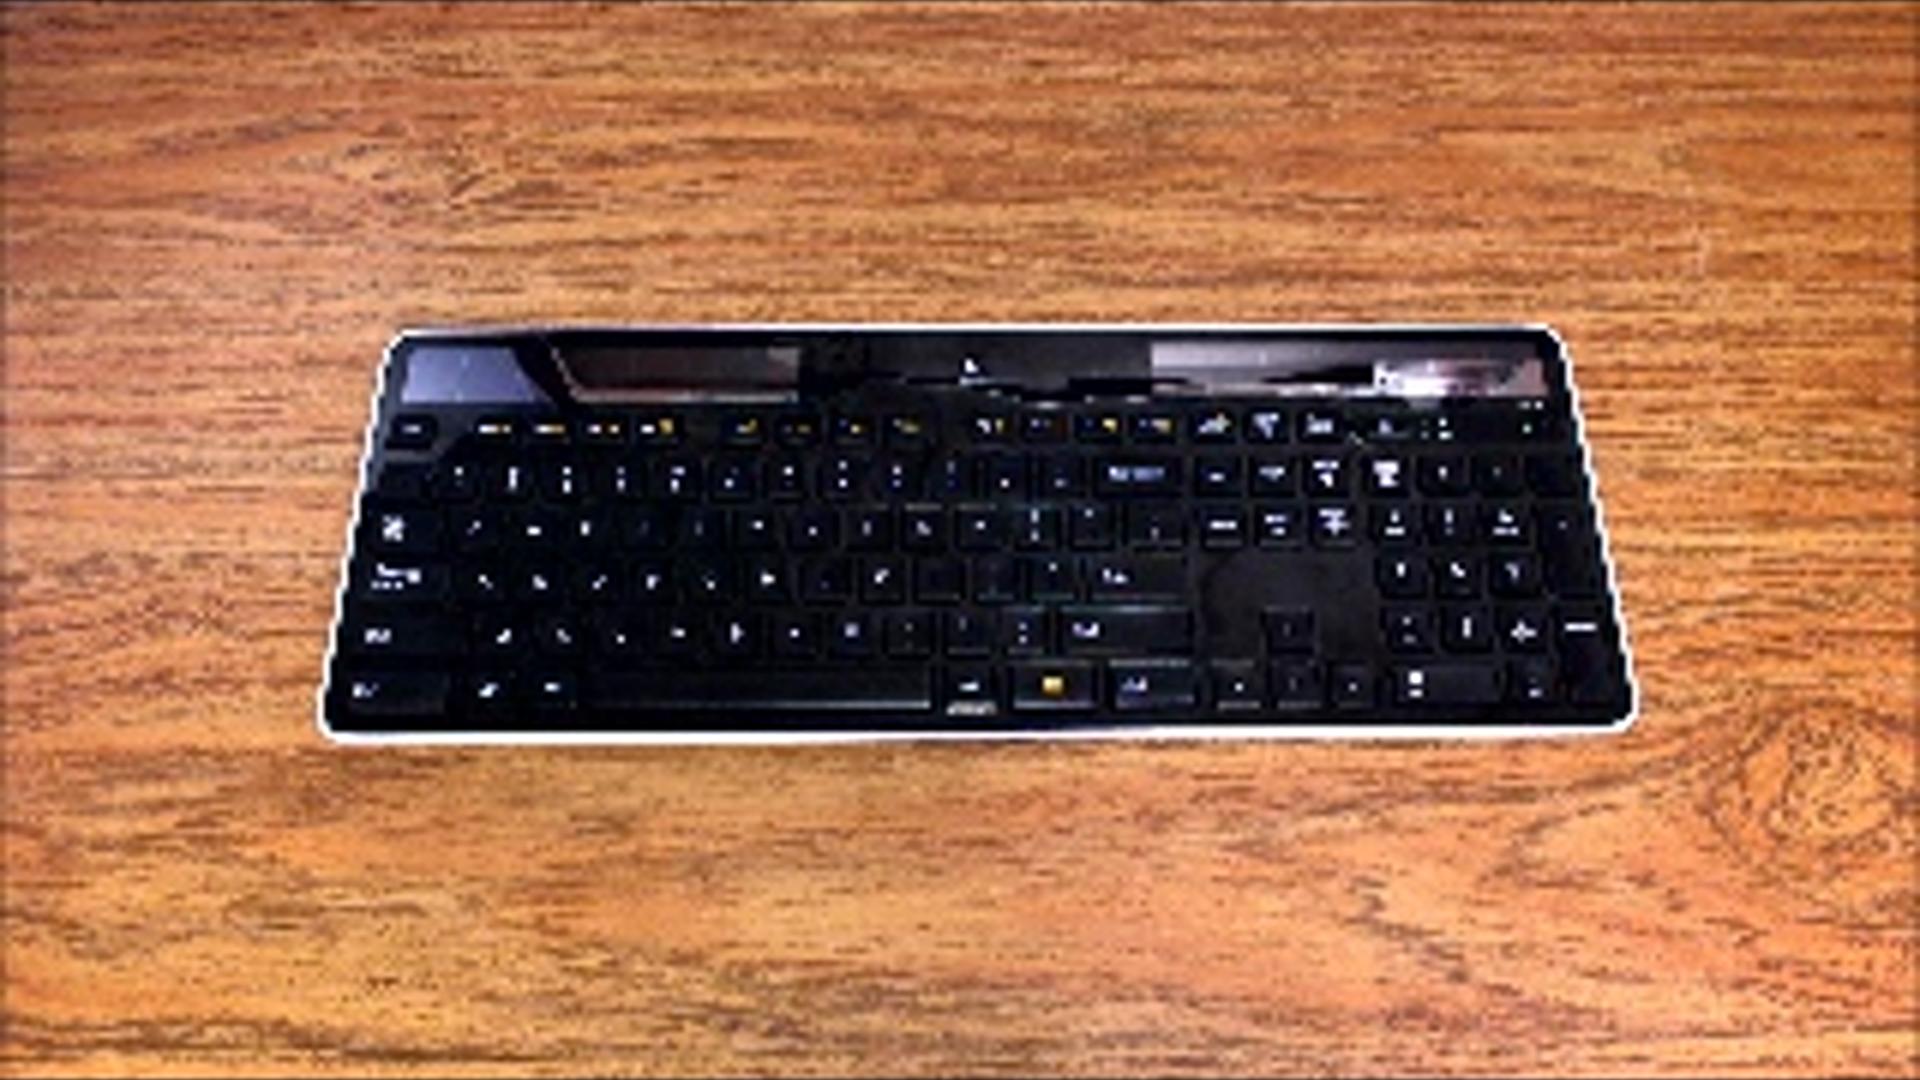 DADUIZHANG Profession Game Mechanical Wired 3 Colors Led Backlit 38 Keys R Keypad Illuminated Left Single Hand Gaming Keyboard for Pc Laptop Black